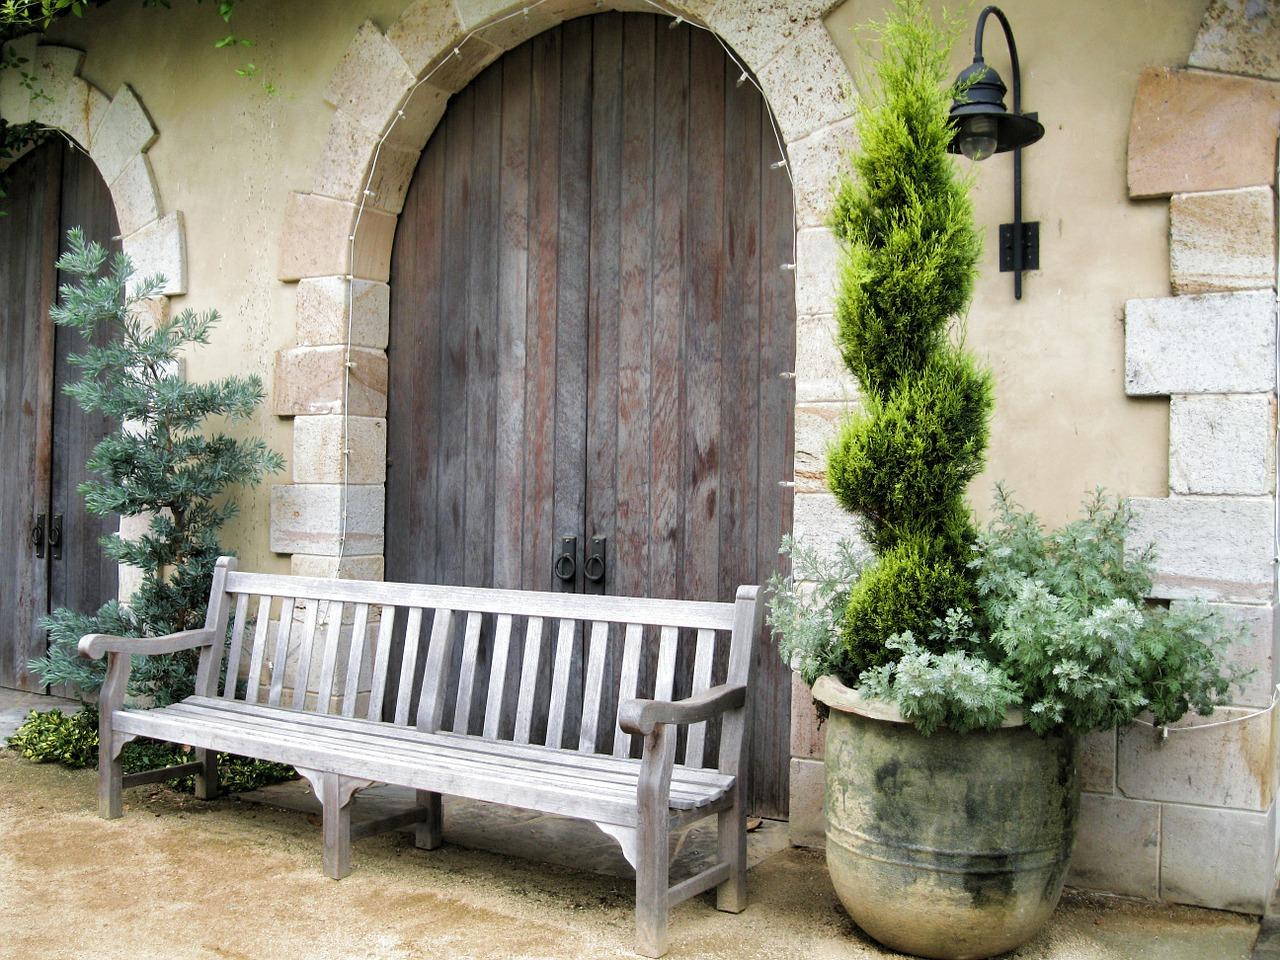 wood-bench-396339_1280.jpg